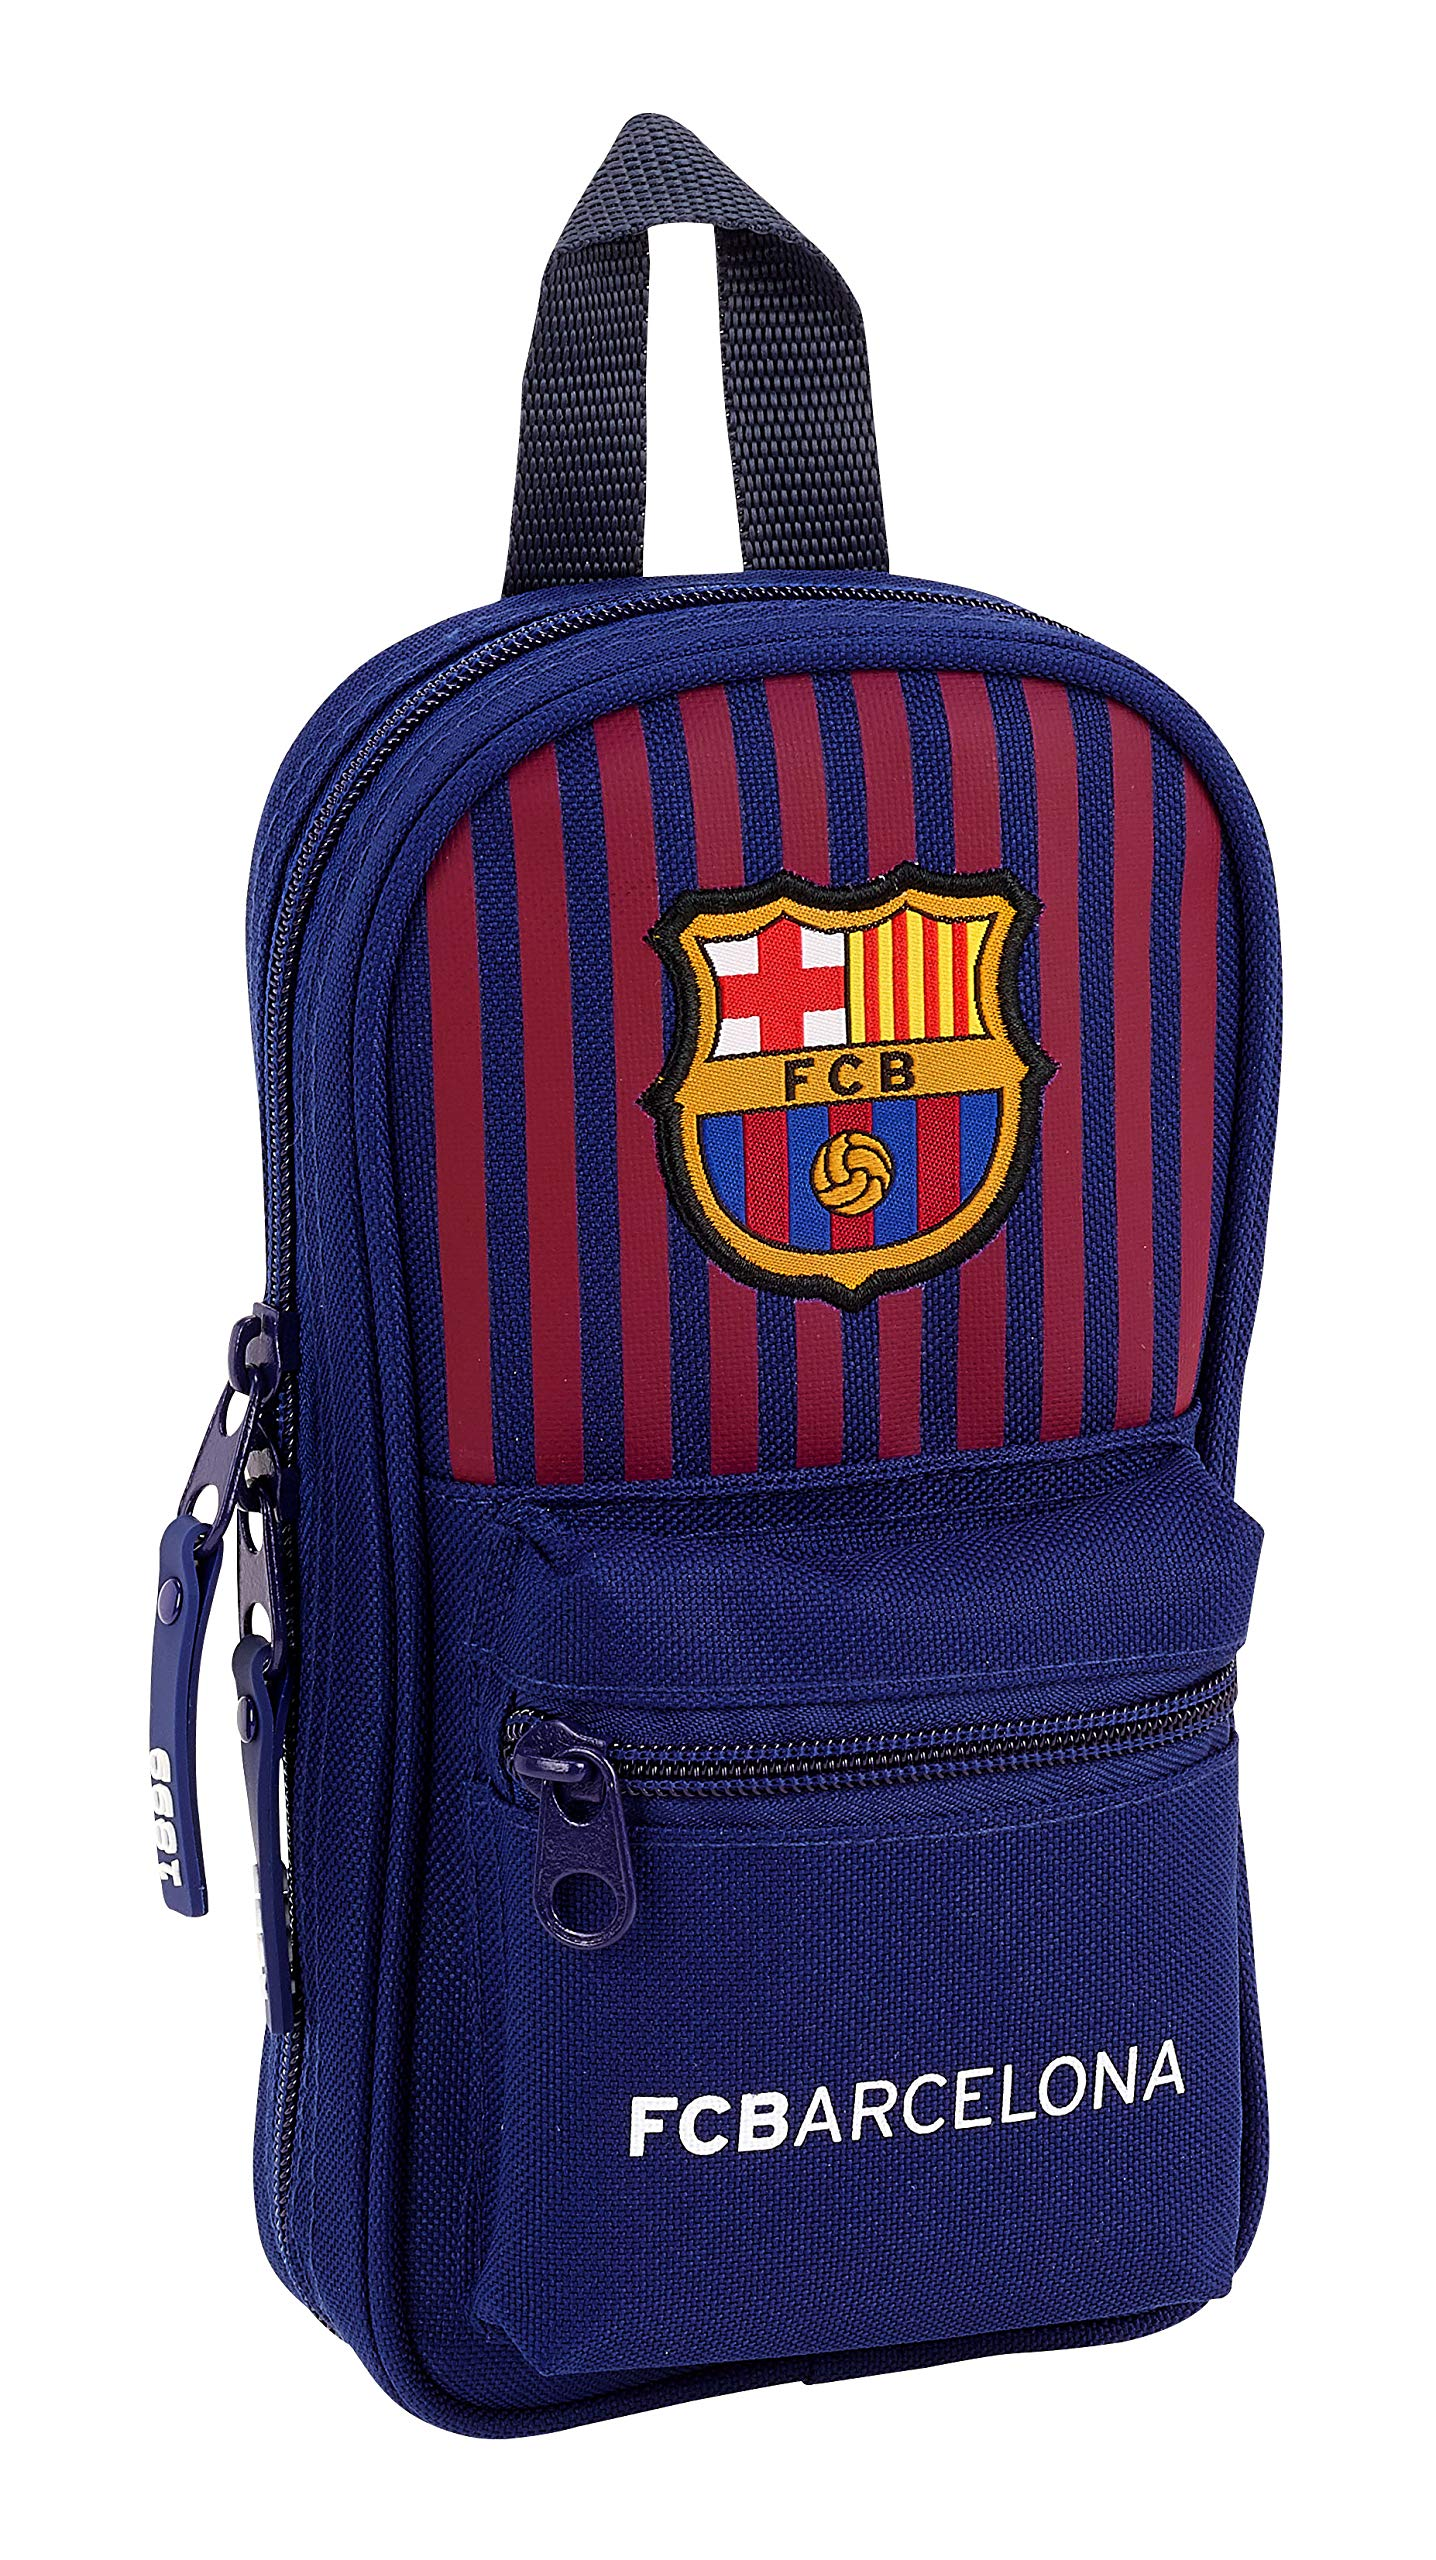 FC Barcelona 411829847 2018 Neceser 23 cm, Azul